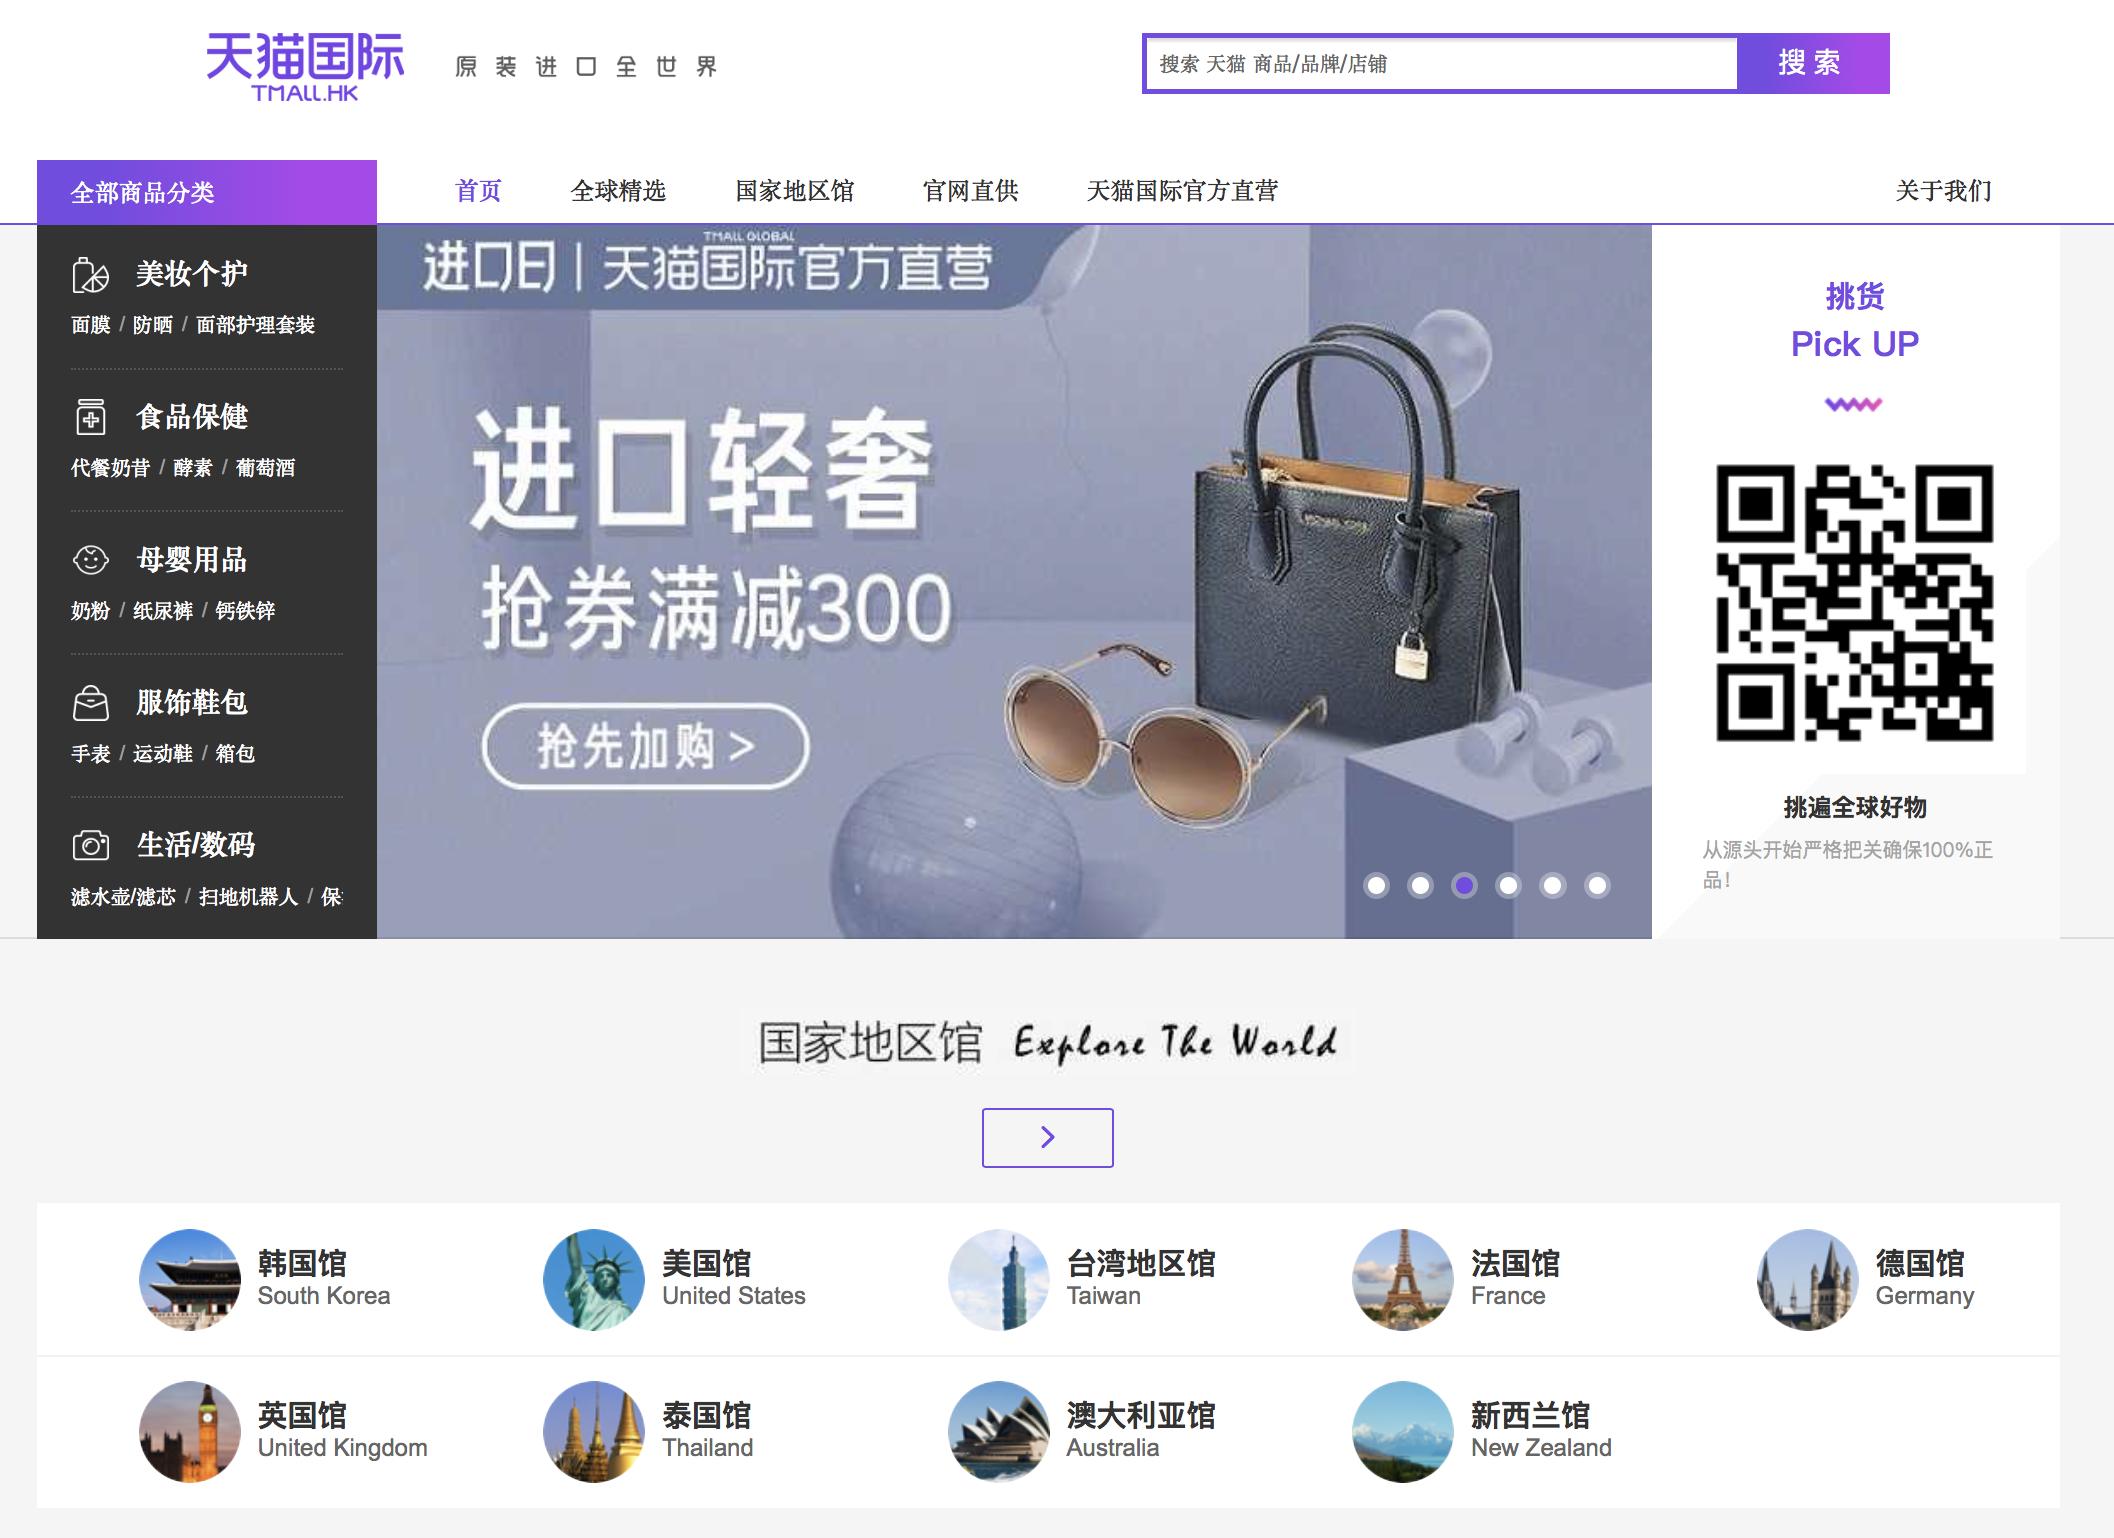 China's Taobao Mall (Tmall)